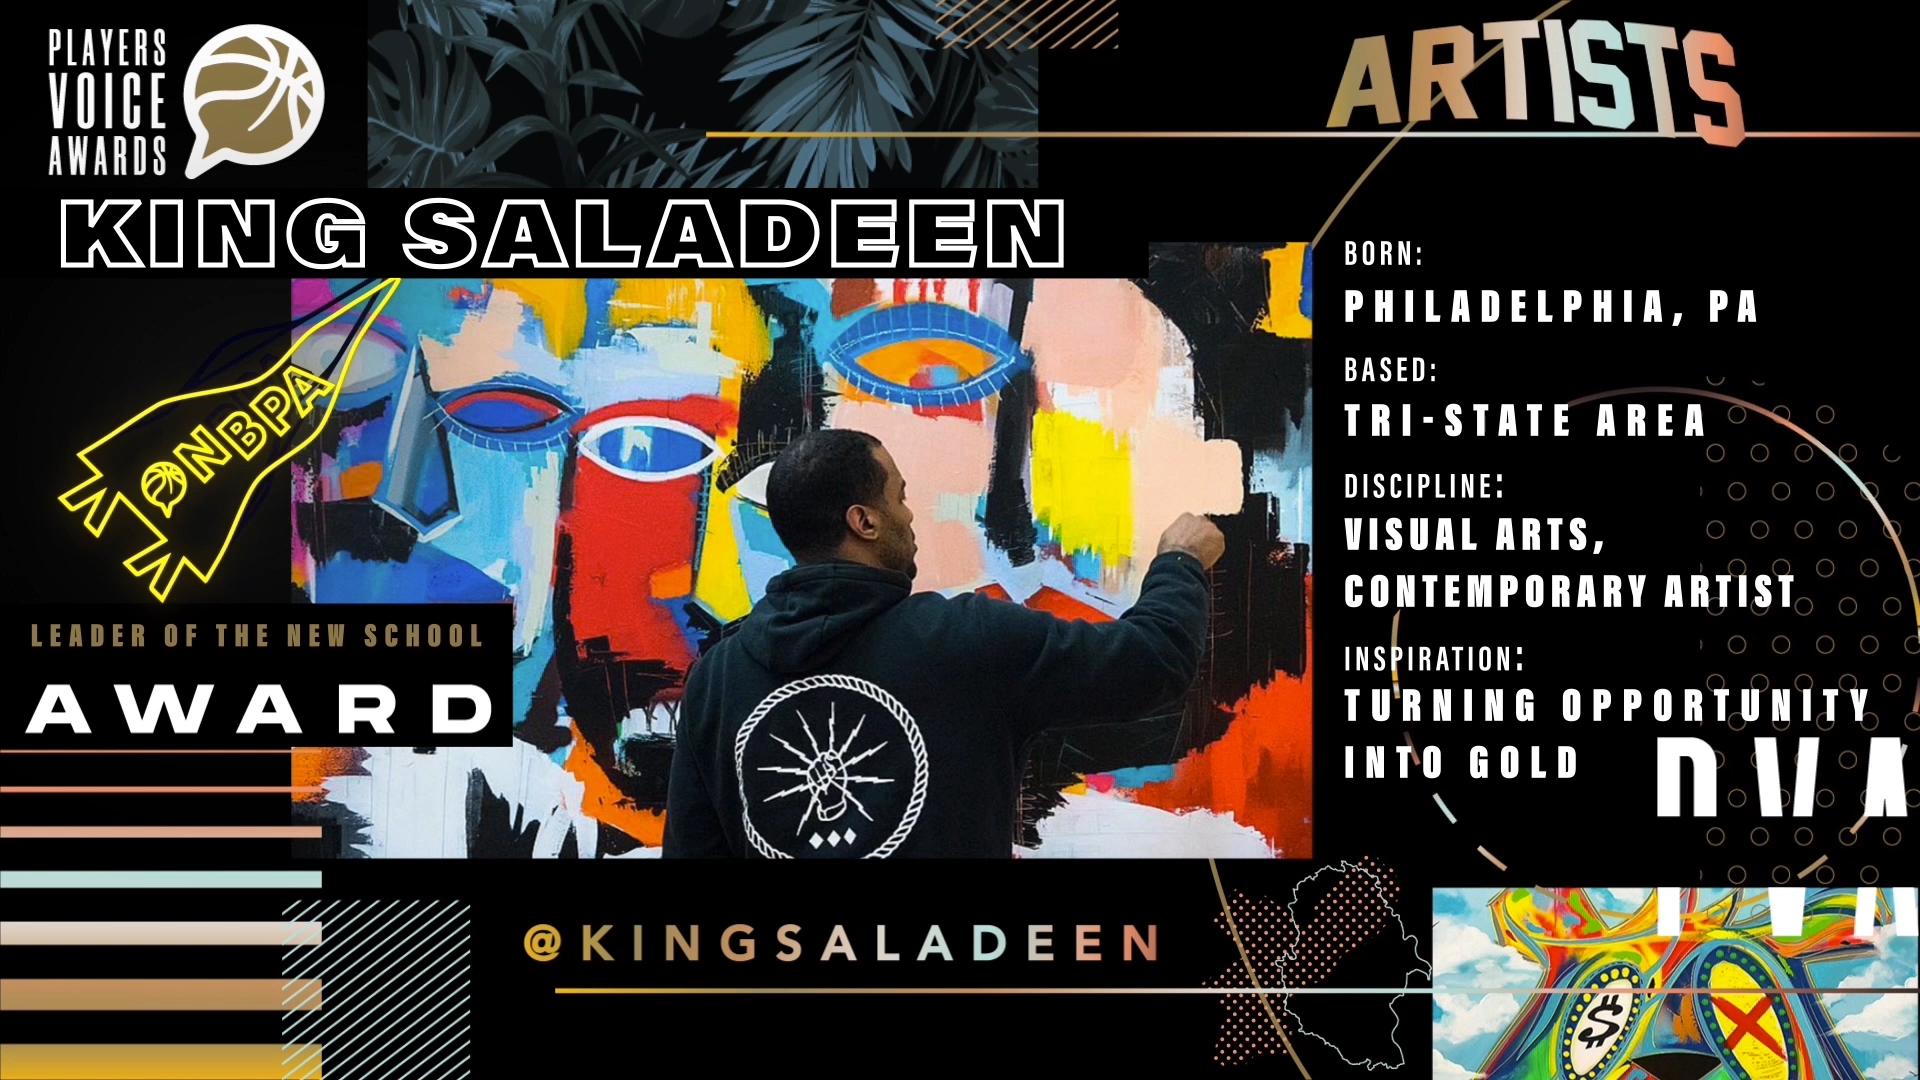 King Saladeen